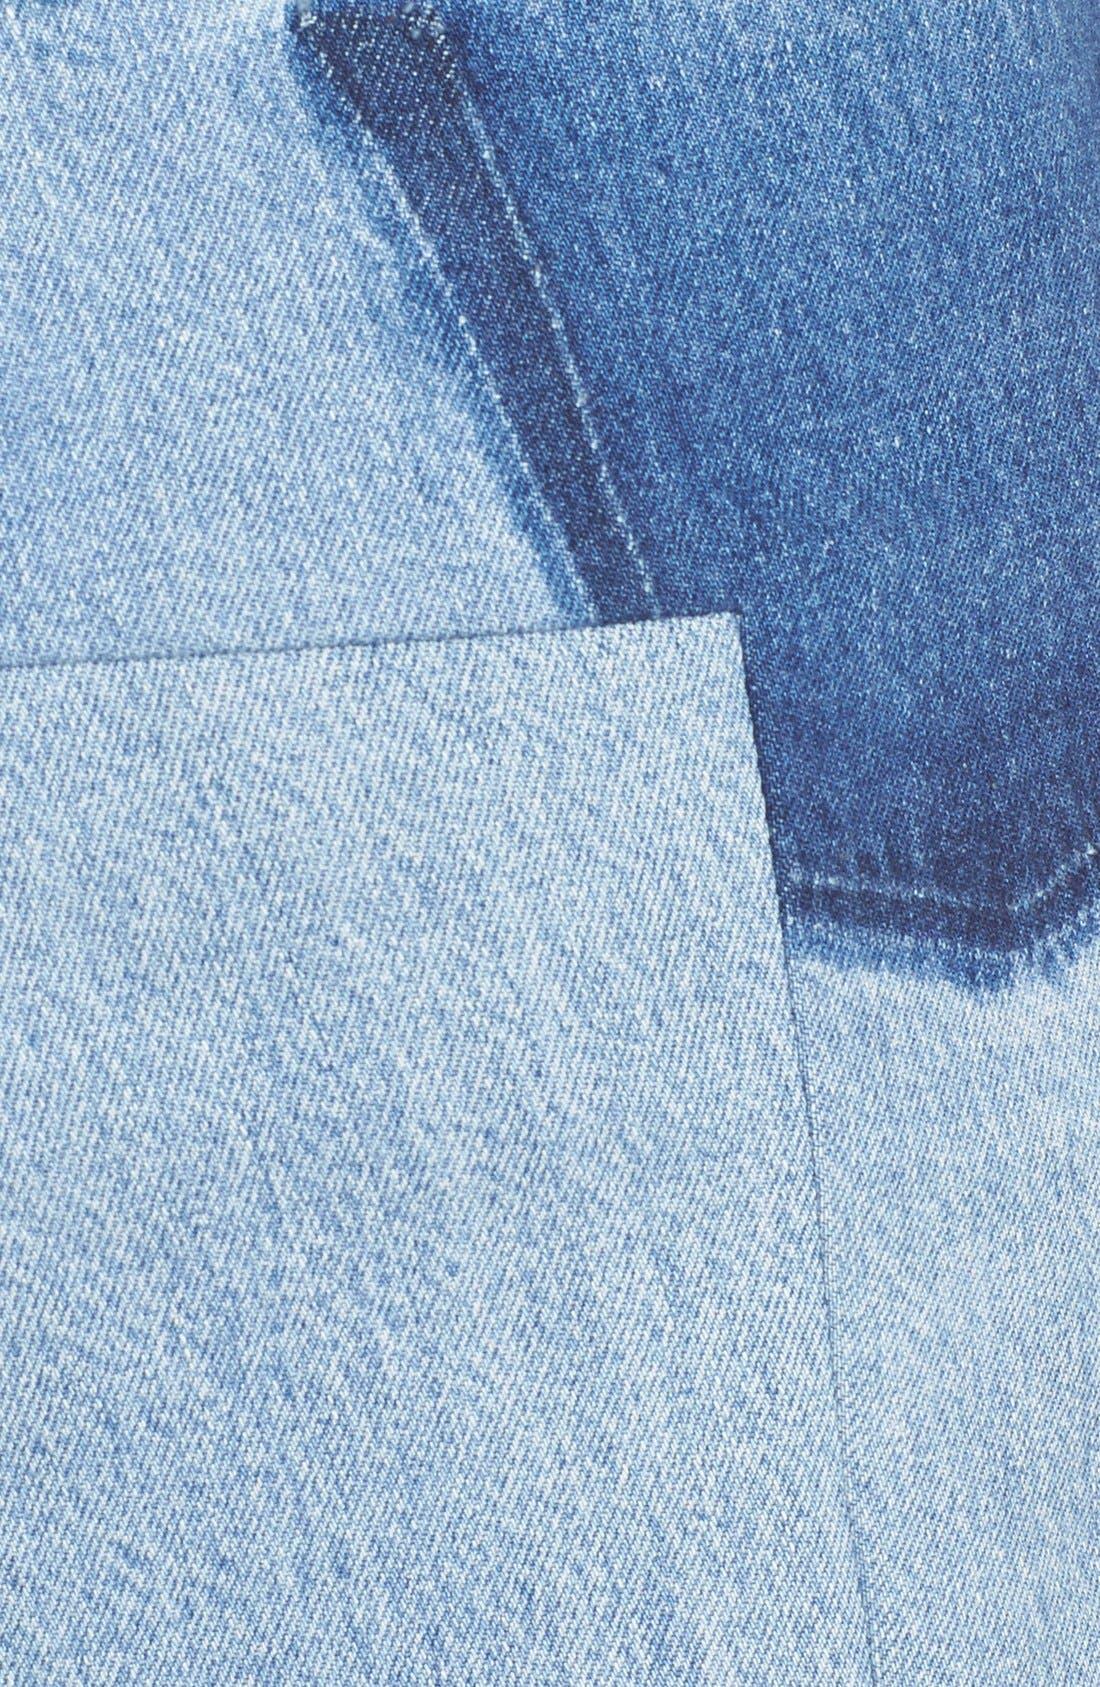 Alternate Image 3  - Vetements Denim Mini Skirt